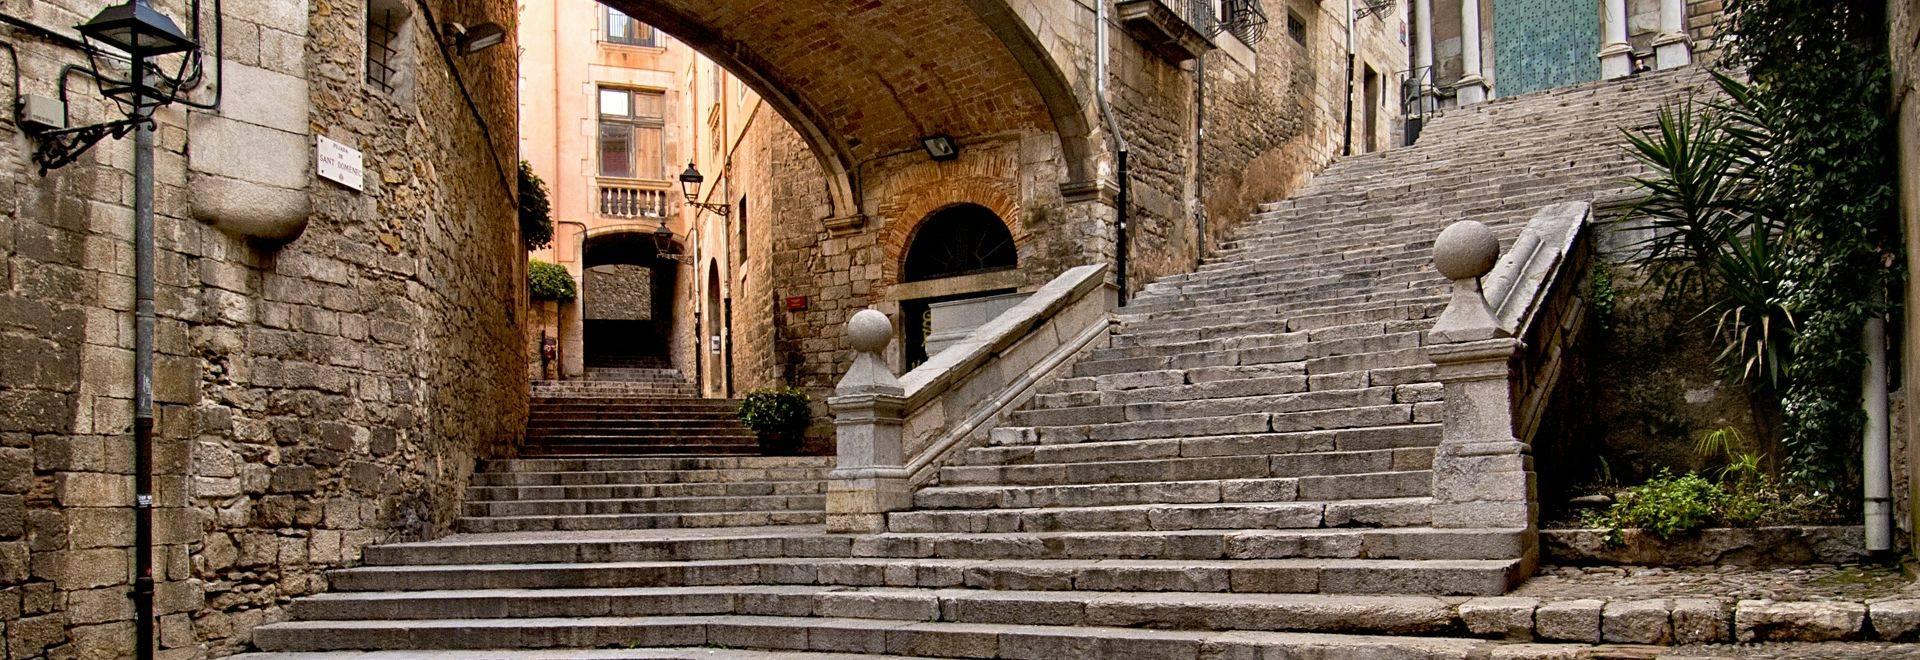 Girona, medieval streets